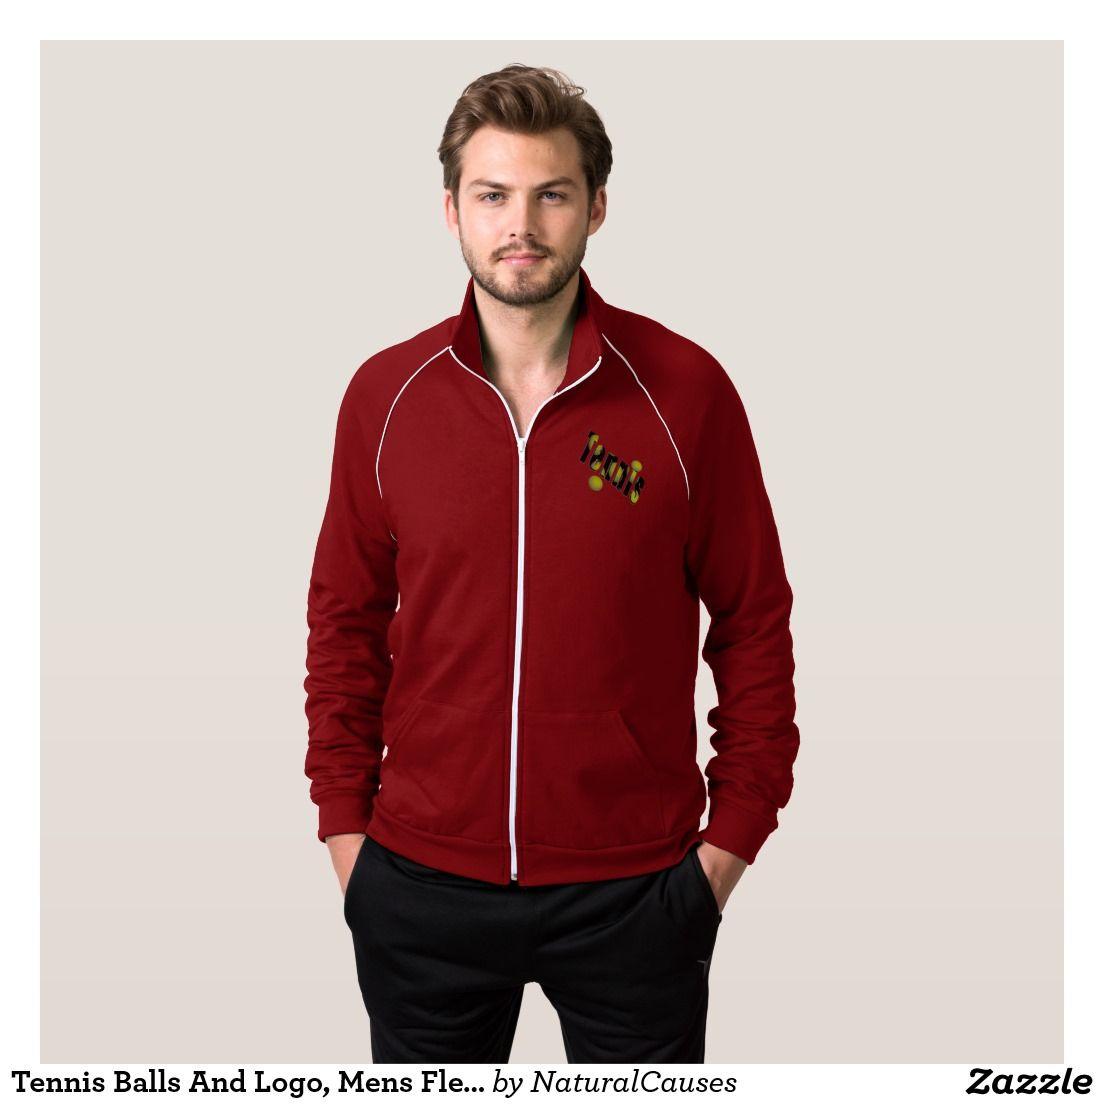 Tennis logo and balls jacket mens fleece jacket and tennis